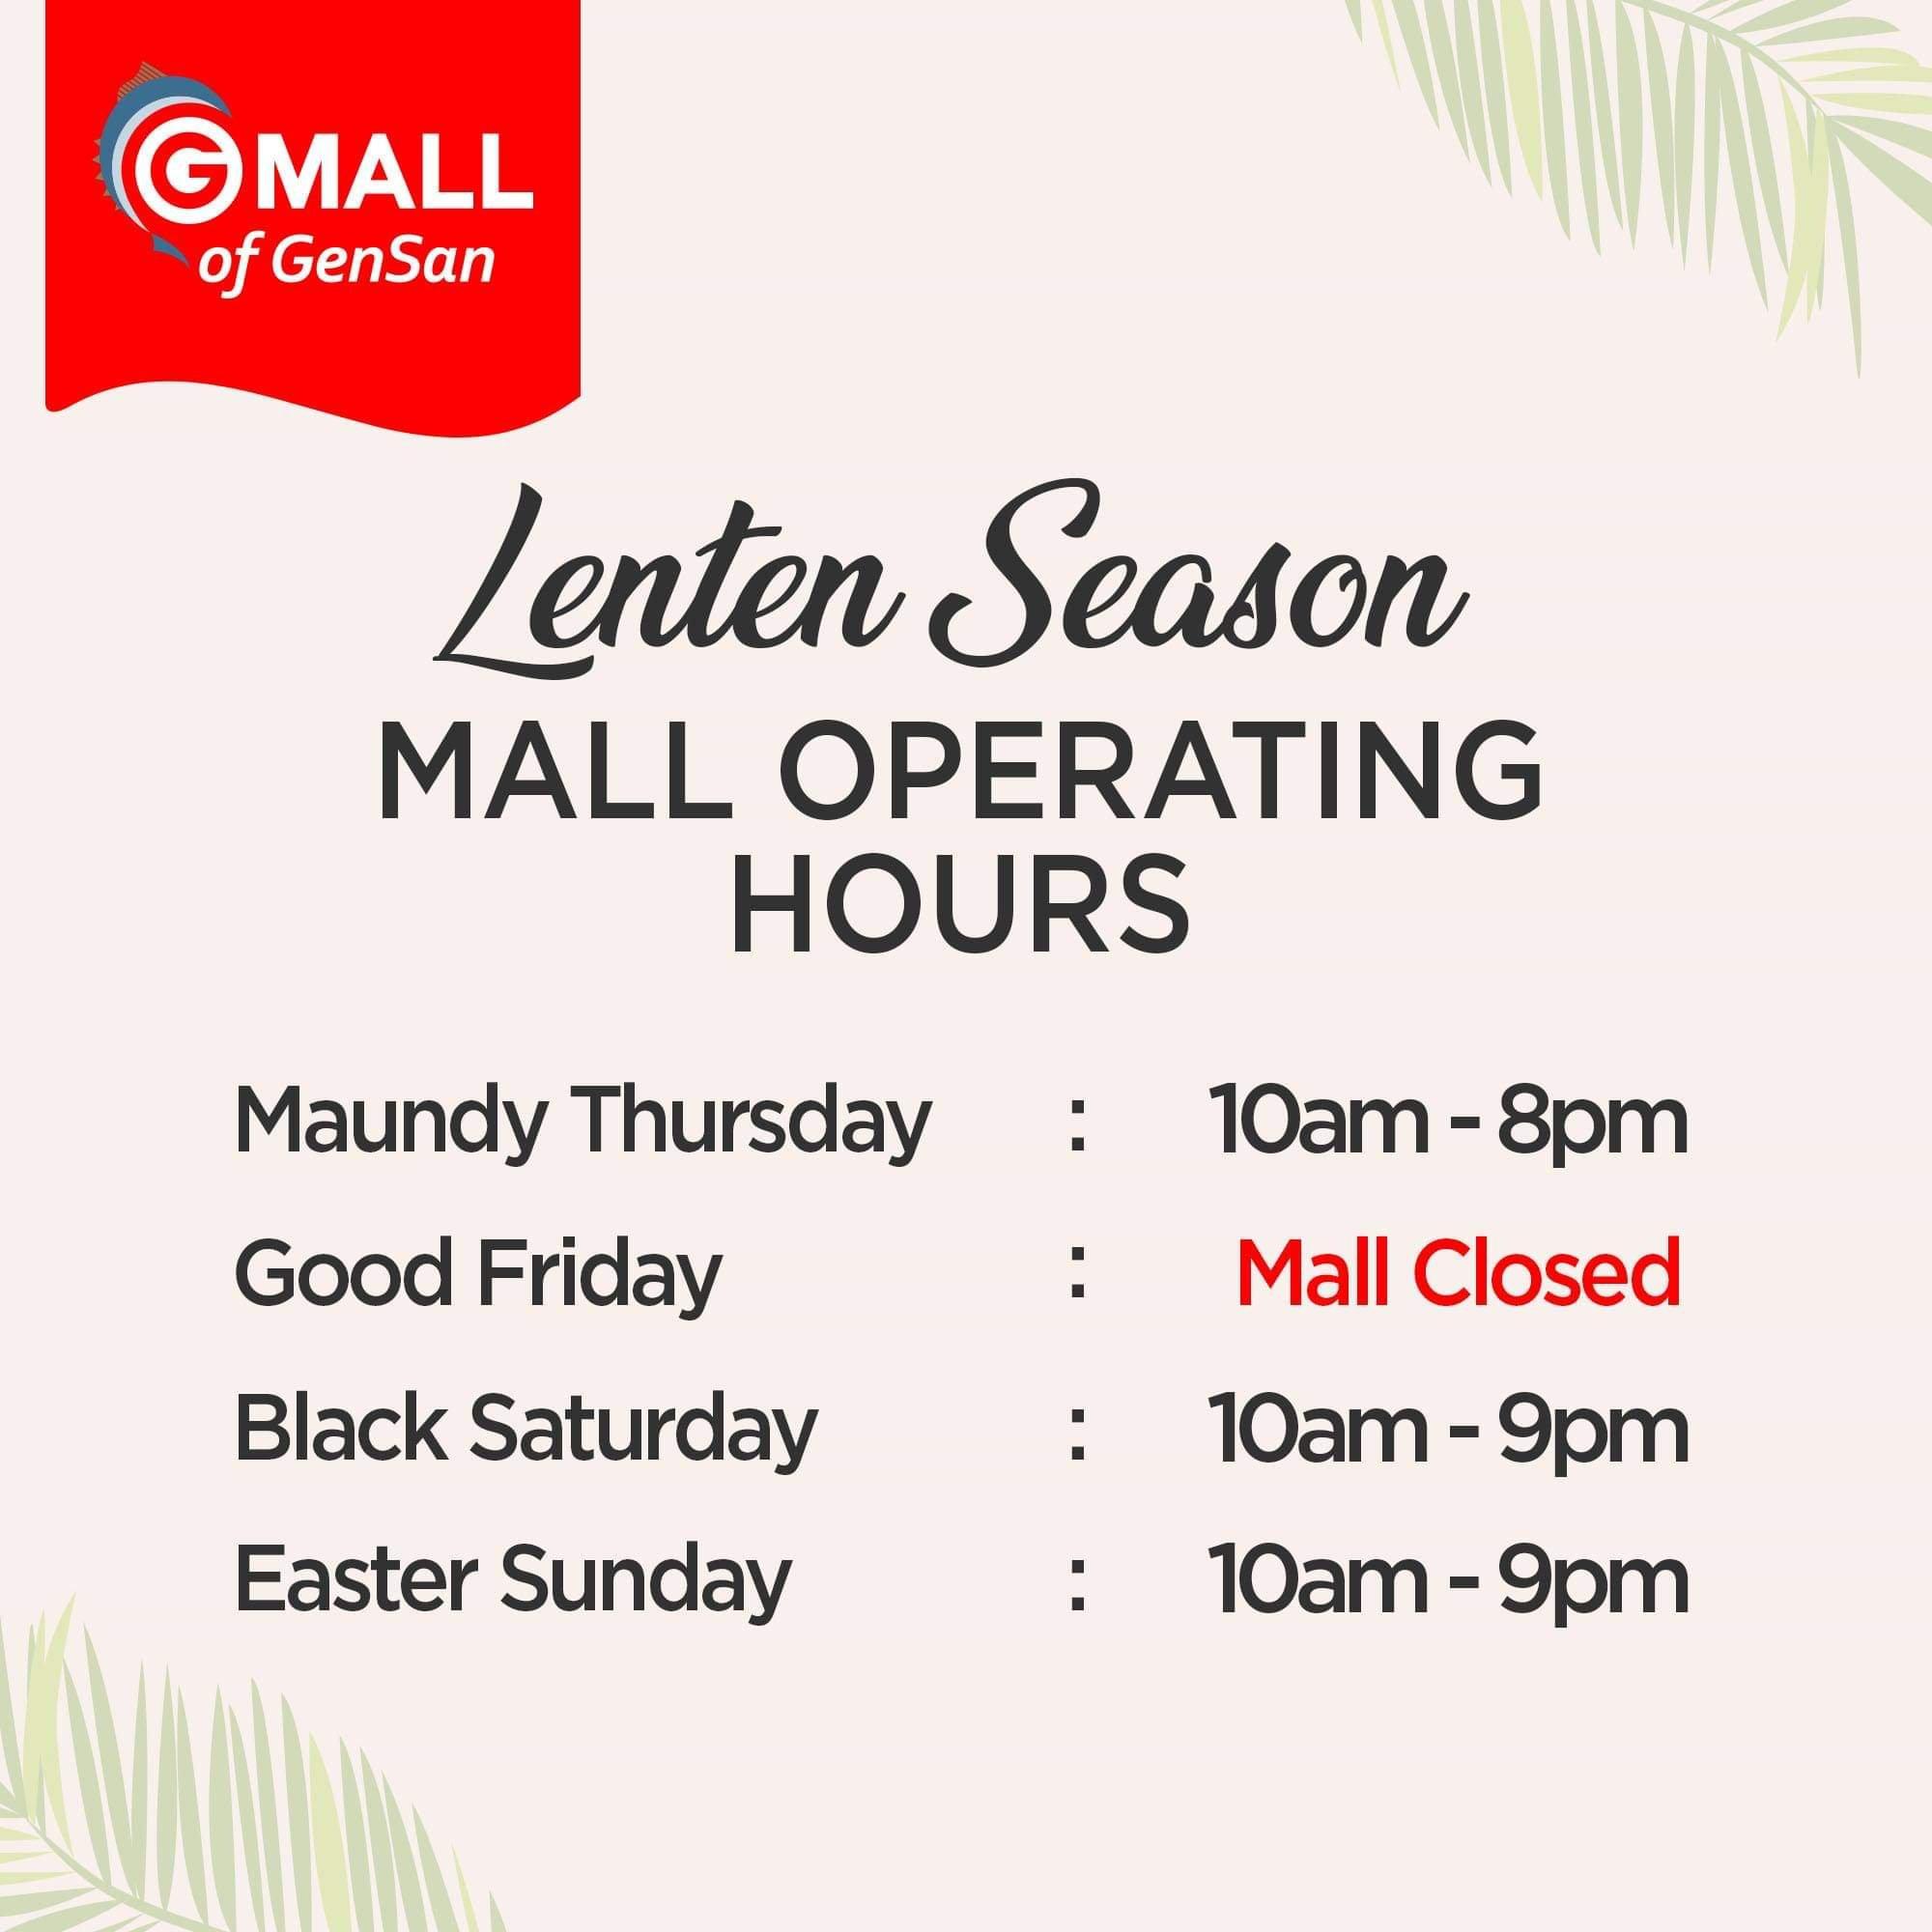 Gaisano Mall of Gensan Holy Week 2019 Schedule